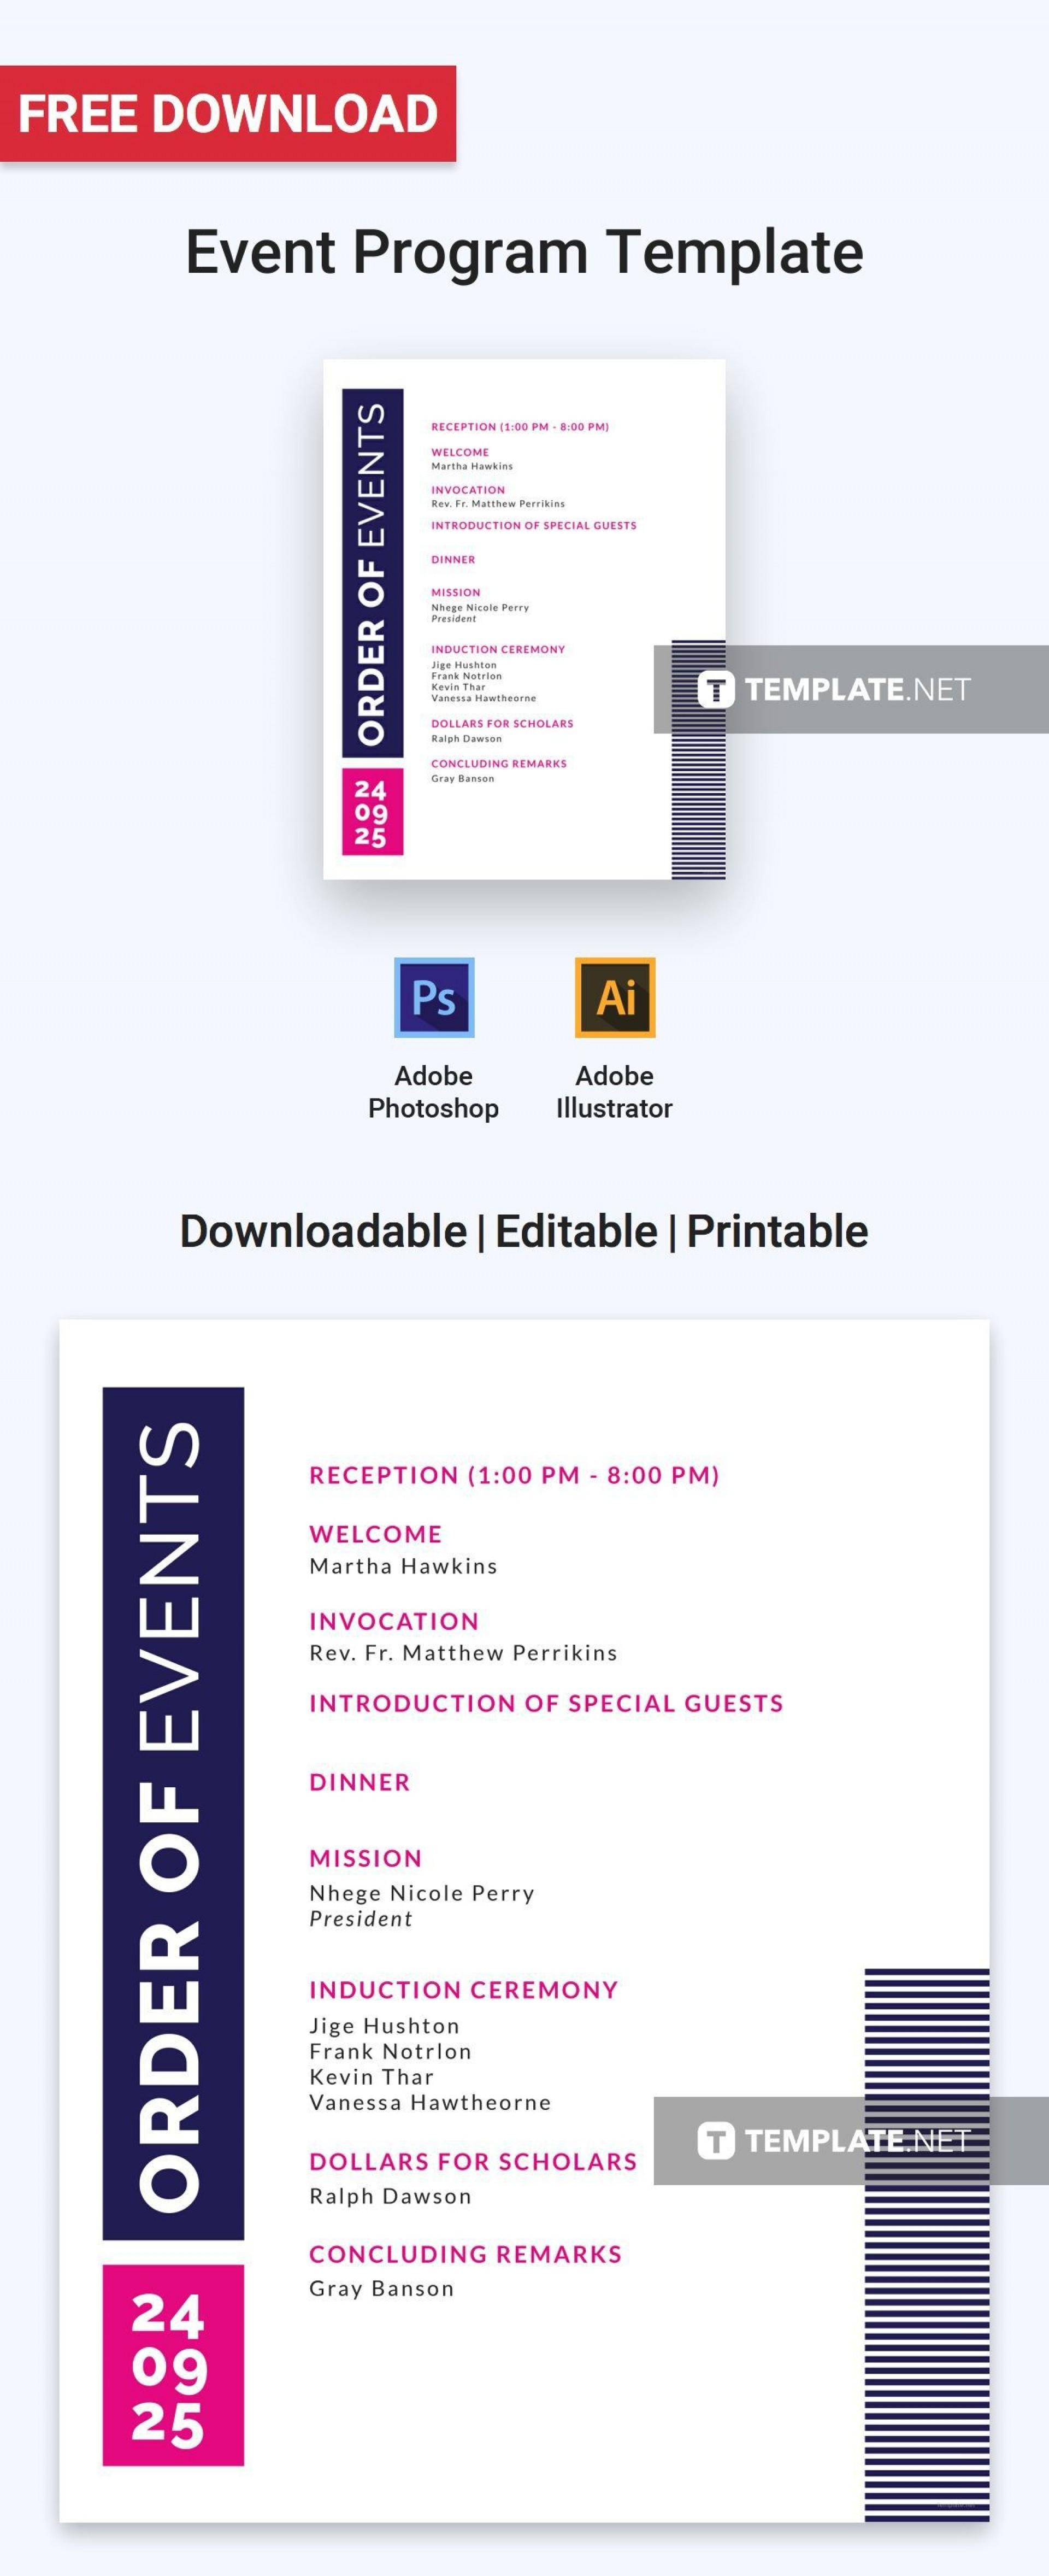 004 Simple Free Event Program Template Concept  Templates Half Fold Online Download1920